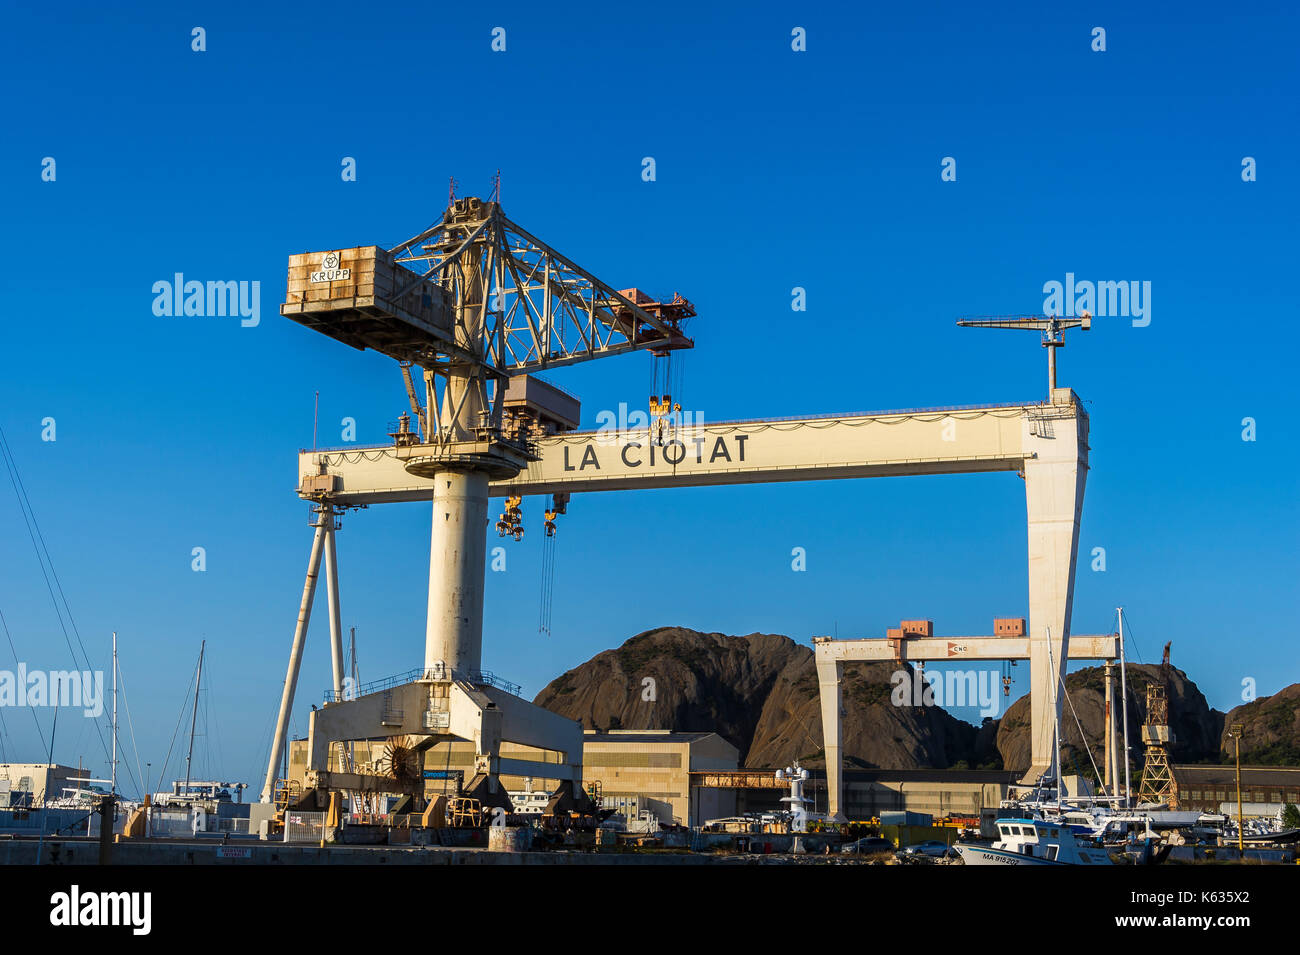 Chantiers Navals de La Ciotat, BDR, France - Stock Image